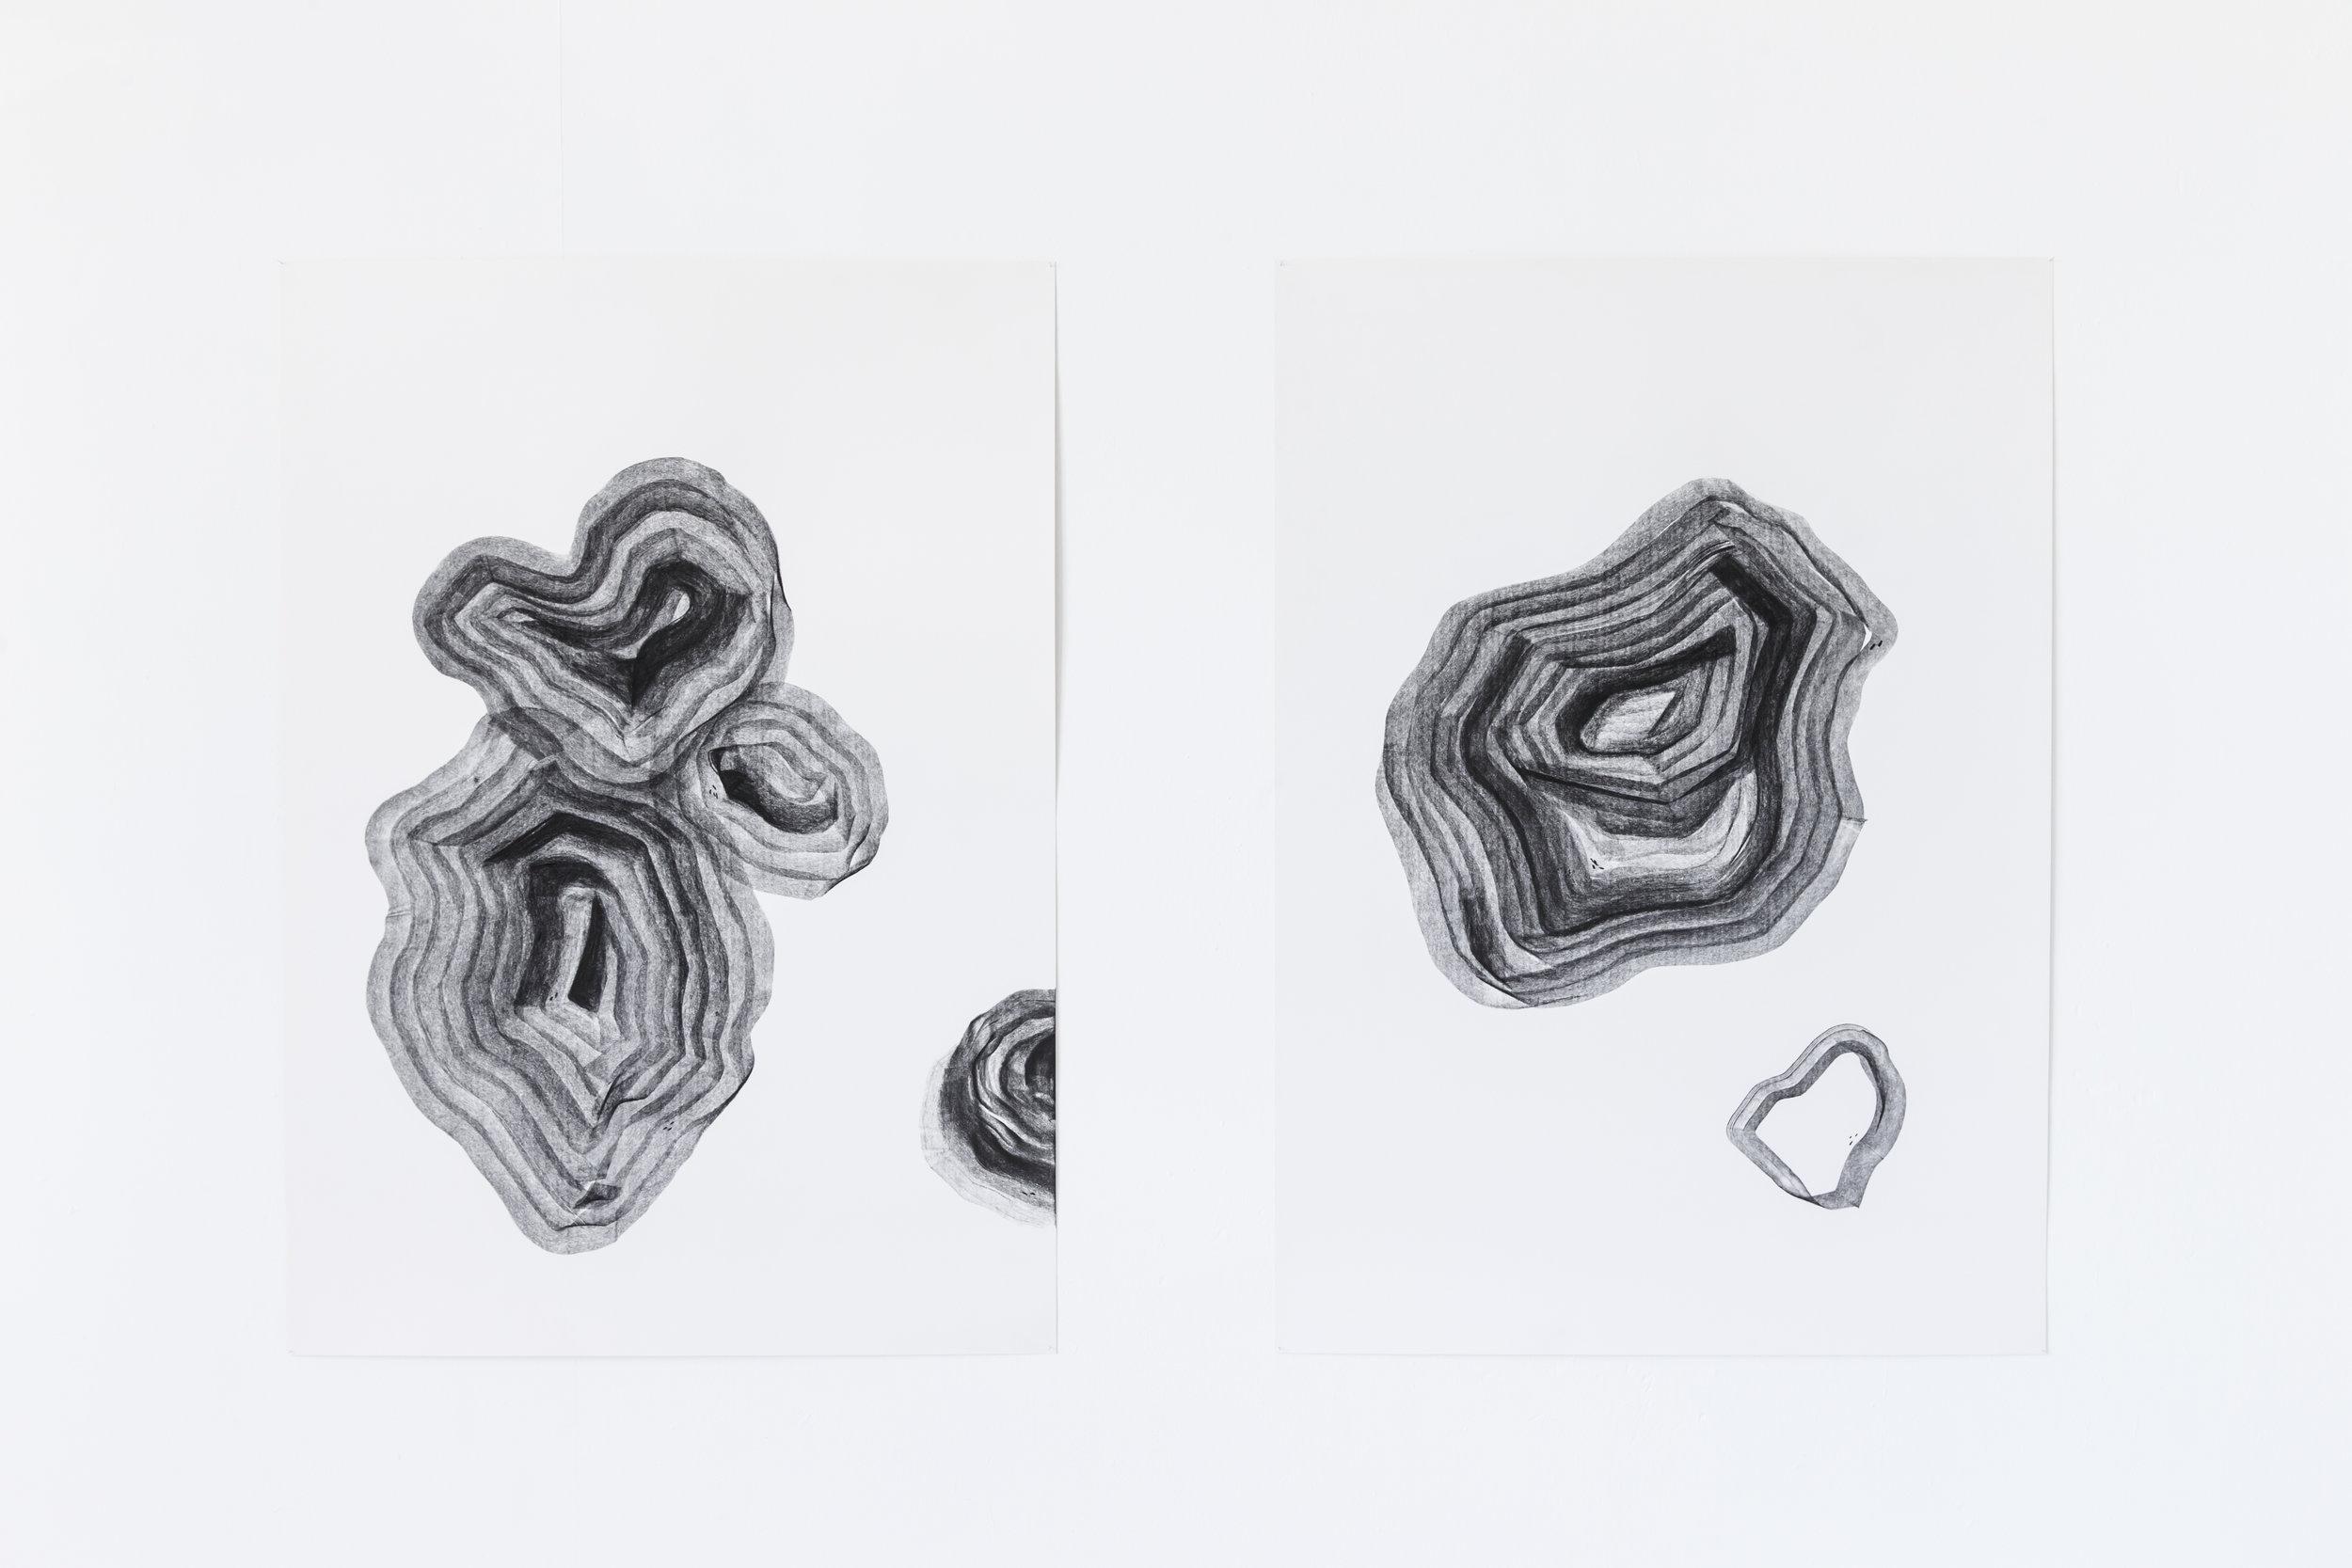 Strates, dessins au fusain, 2013